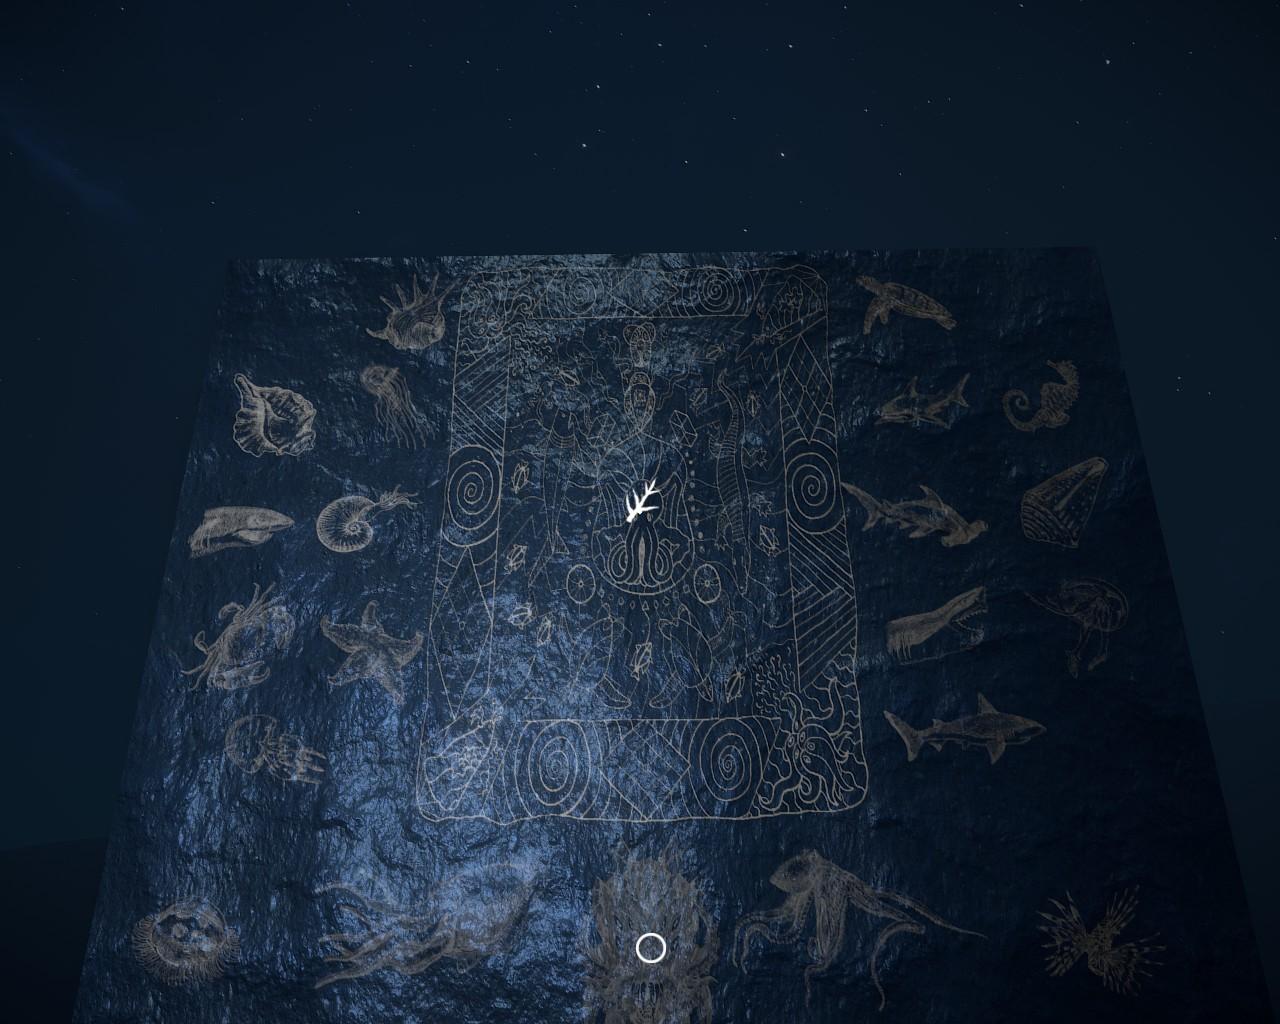 Dagon Achievements Guide ( The Eldritch Biographer ) - Location of secret branches - 5987A3E